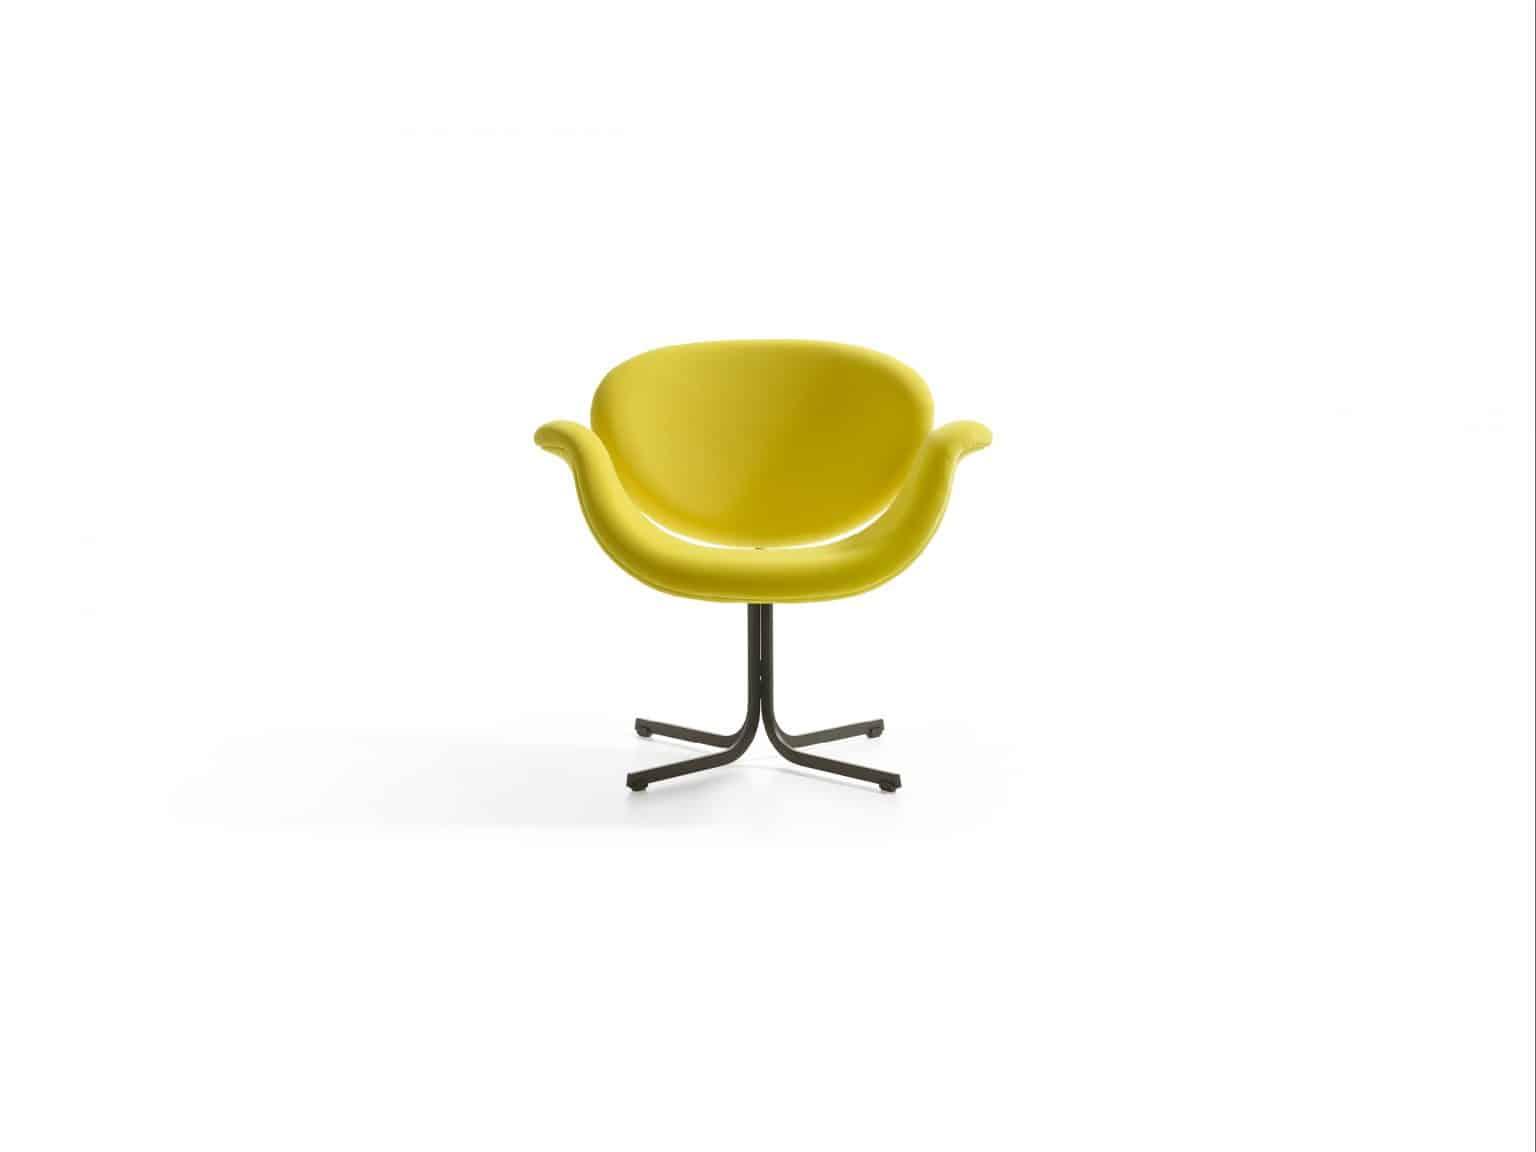 Artifort fauteuil Tulip midi pa